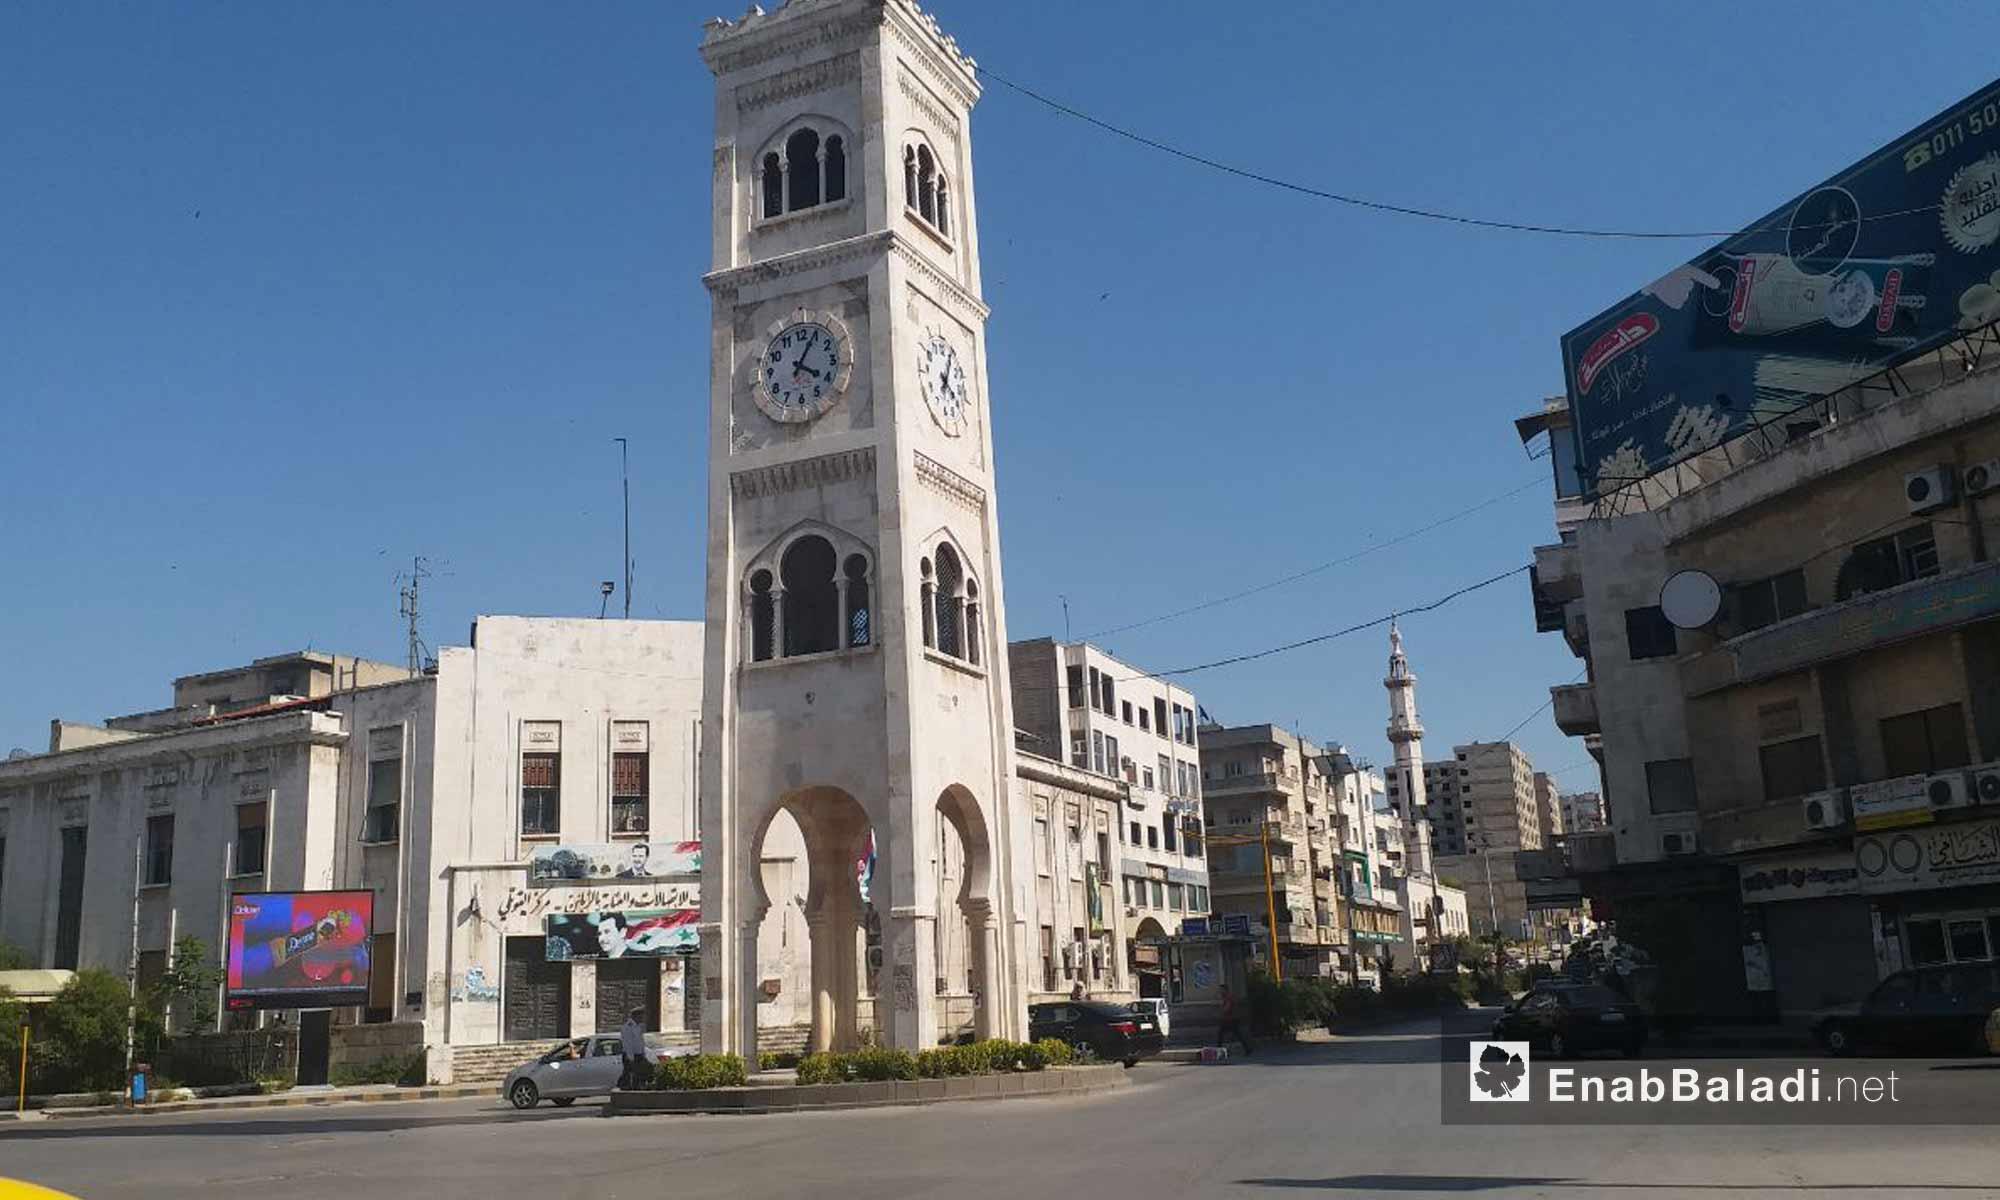 Assi Square in Hama city – May 18, 2019 (Enab Baladi)